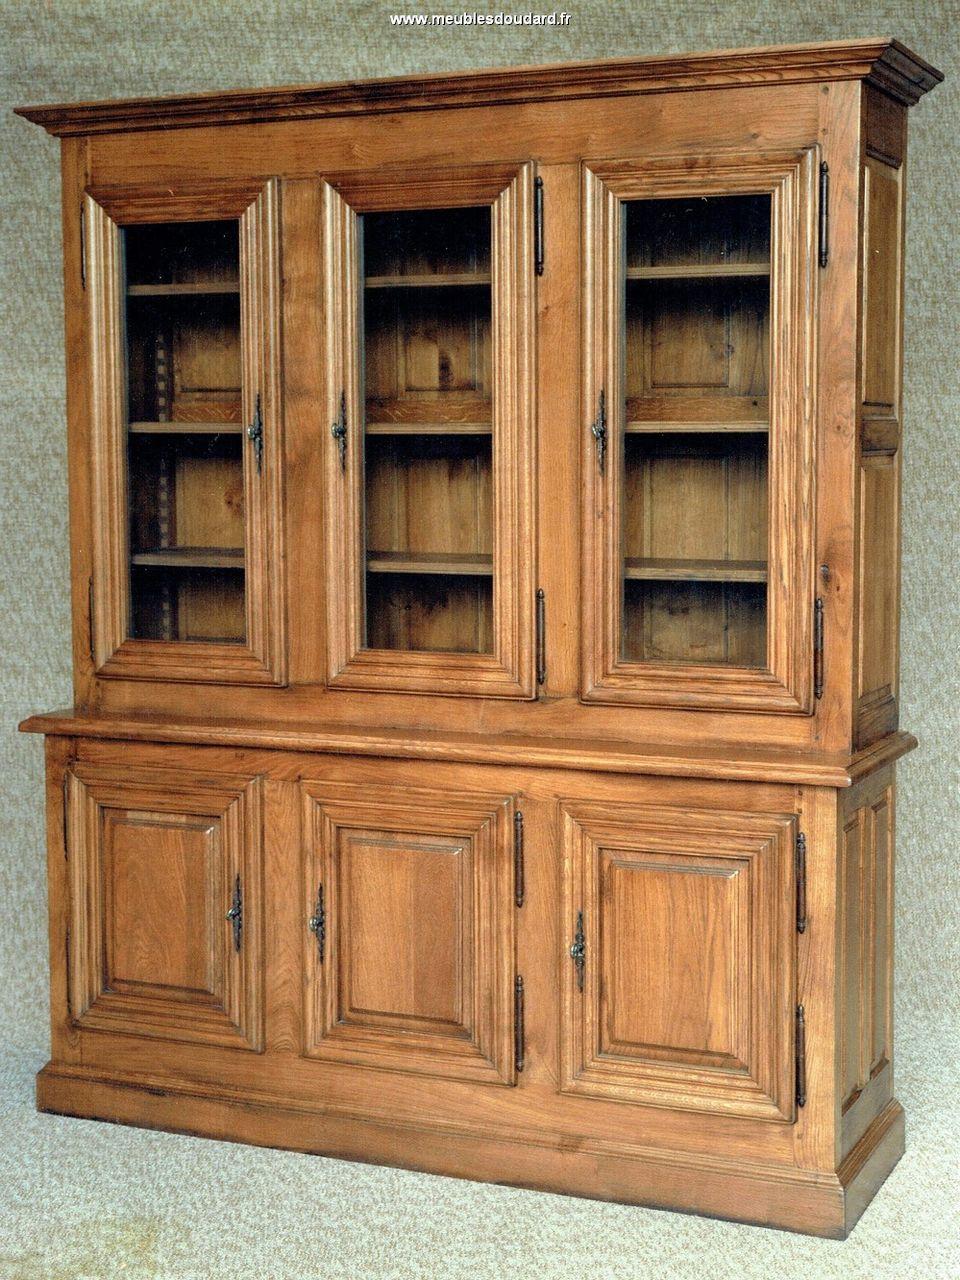 bibliotheque en chene de style rustique louis xiii. Black Bedroom Furniture Sets. Home Design Ideas